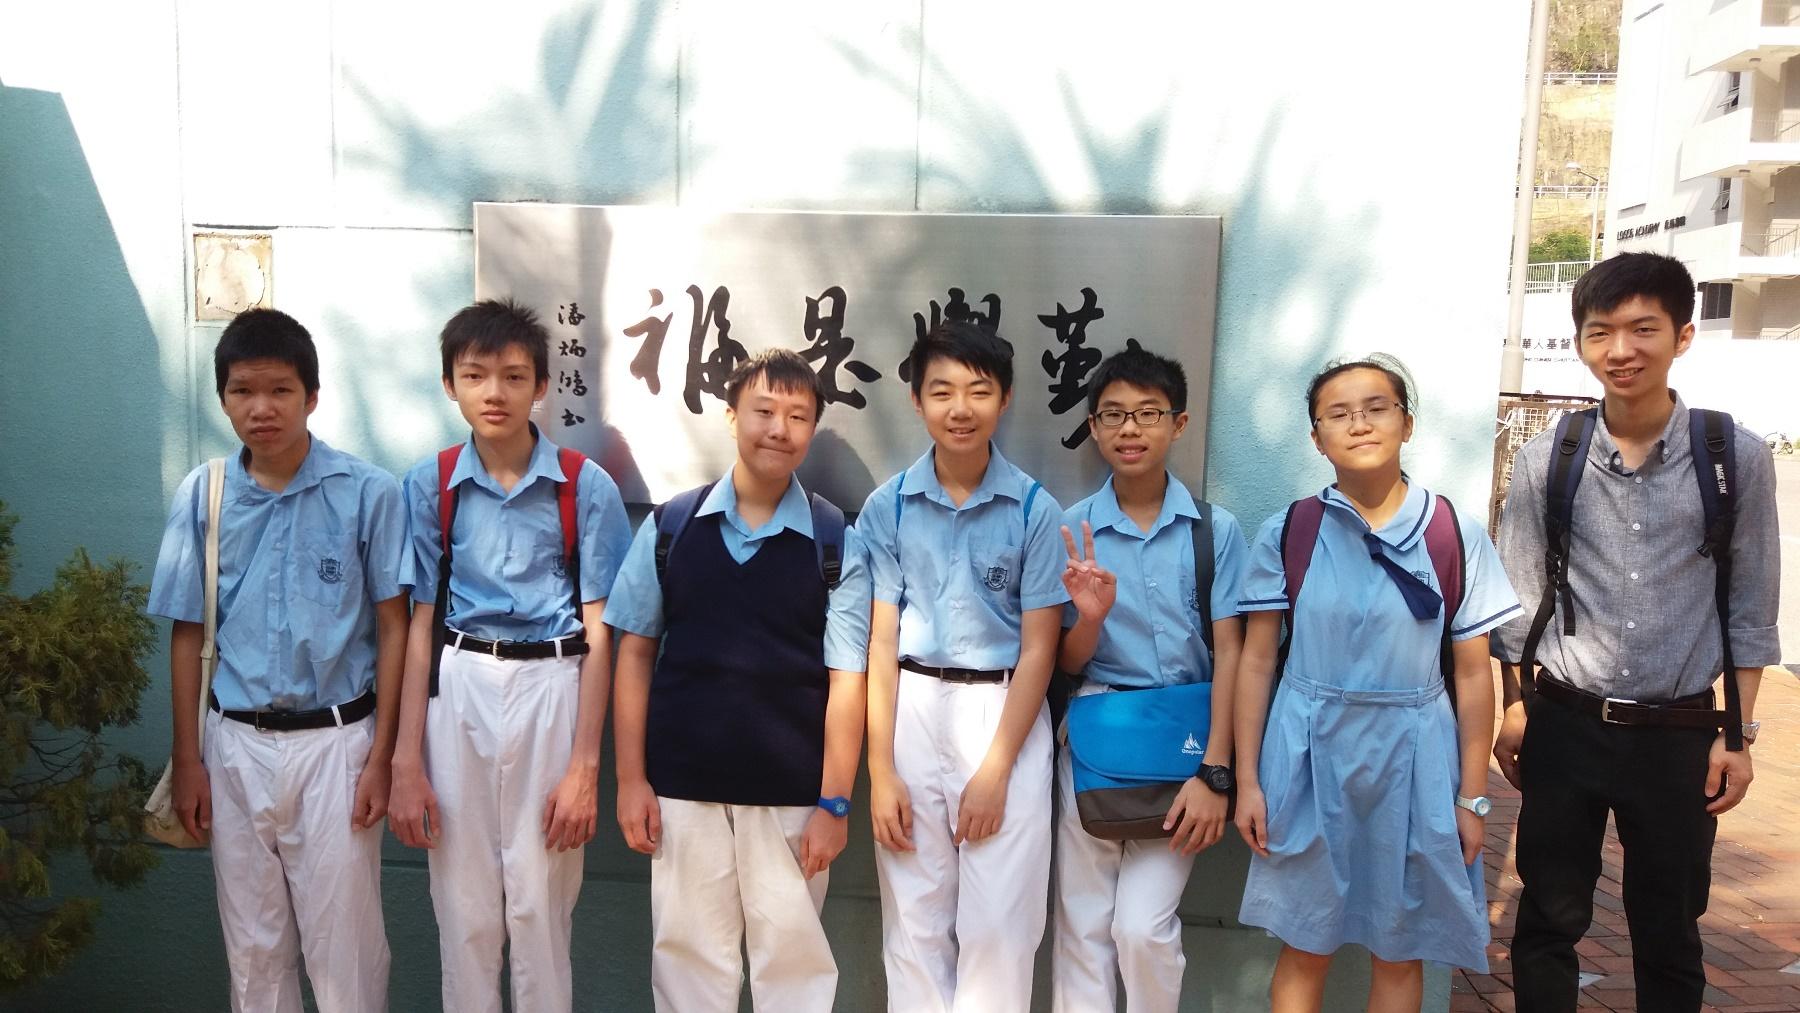 http://www.npc.edu.hk/sites/default/files/20171029_094502.jpg